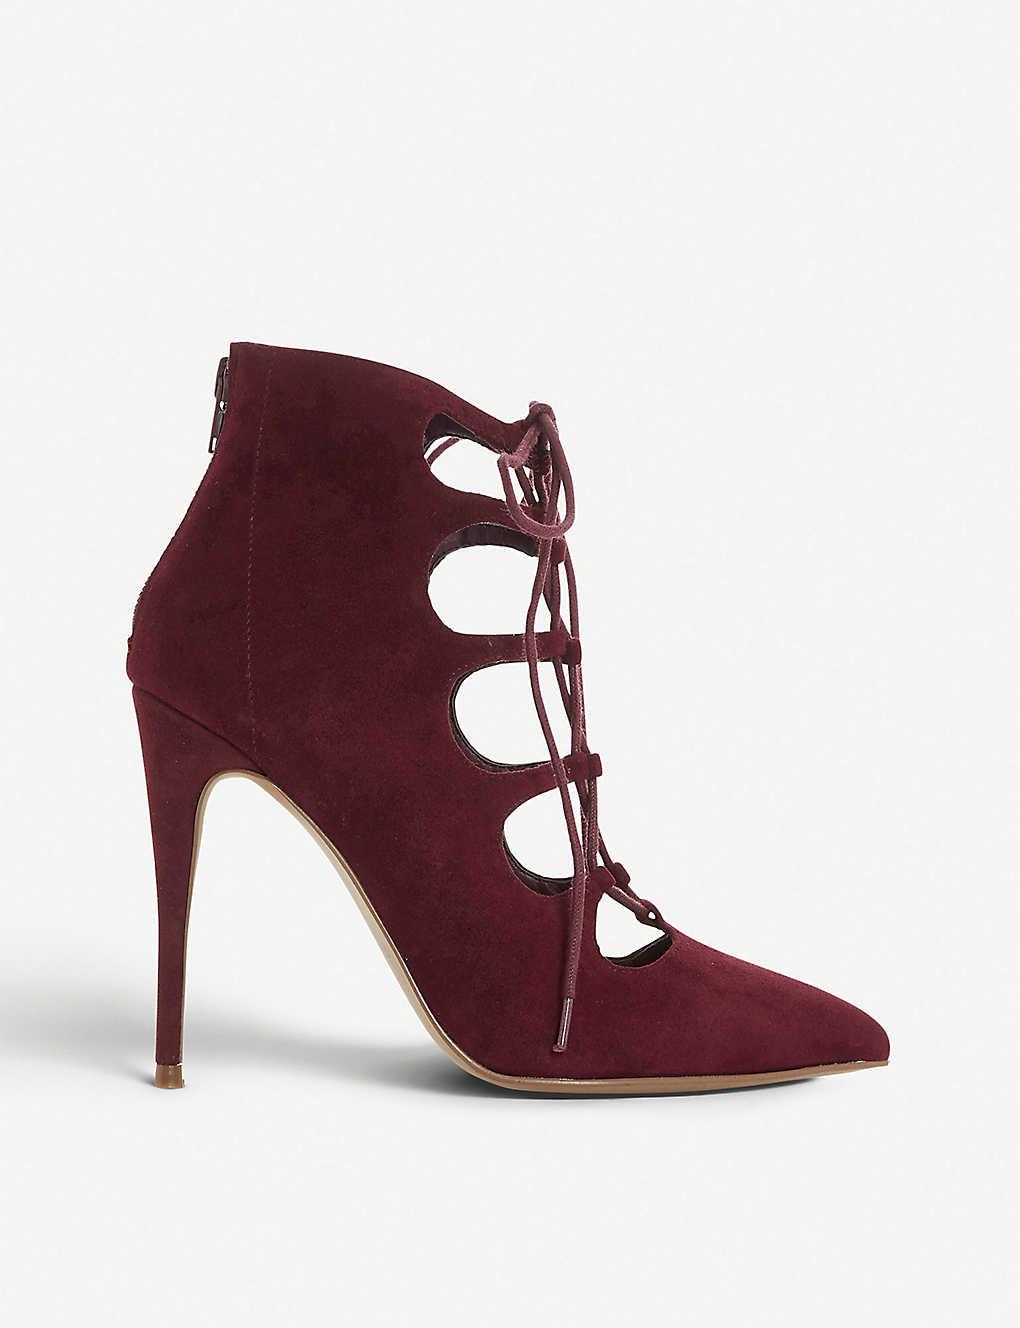 c79aa580c88 Delightful lace-up suede heels - Burgundysuede ...